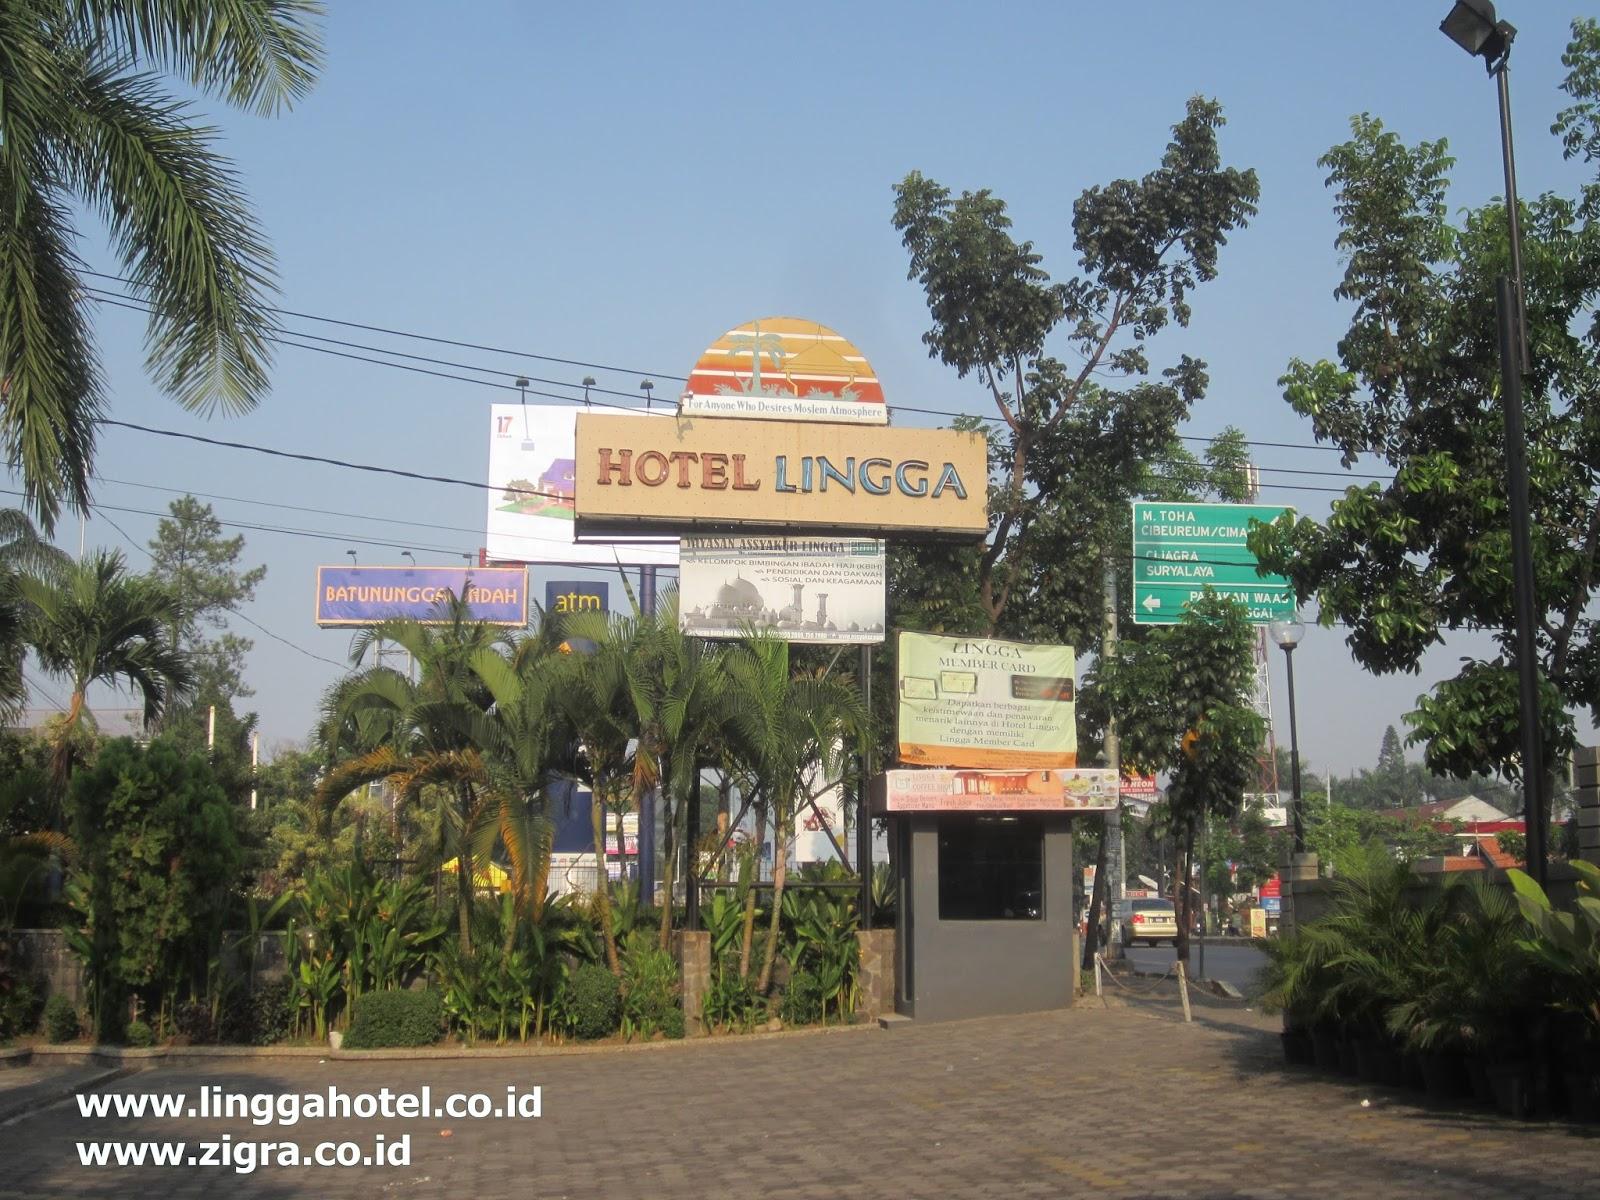 Hotel Yang Dirintis Oleh Almarhum H Anton Taswara Warmana Sejak 11 Juli 1989 Itu Merupakan Pertama Dibangun Di Jalan Soekarno Hatta Bandung